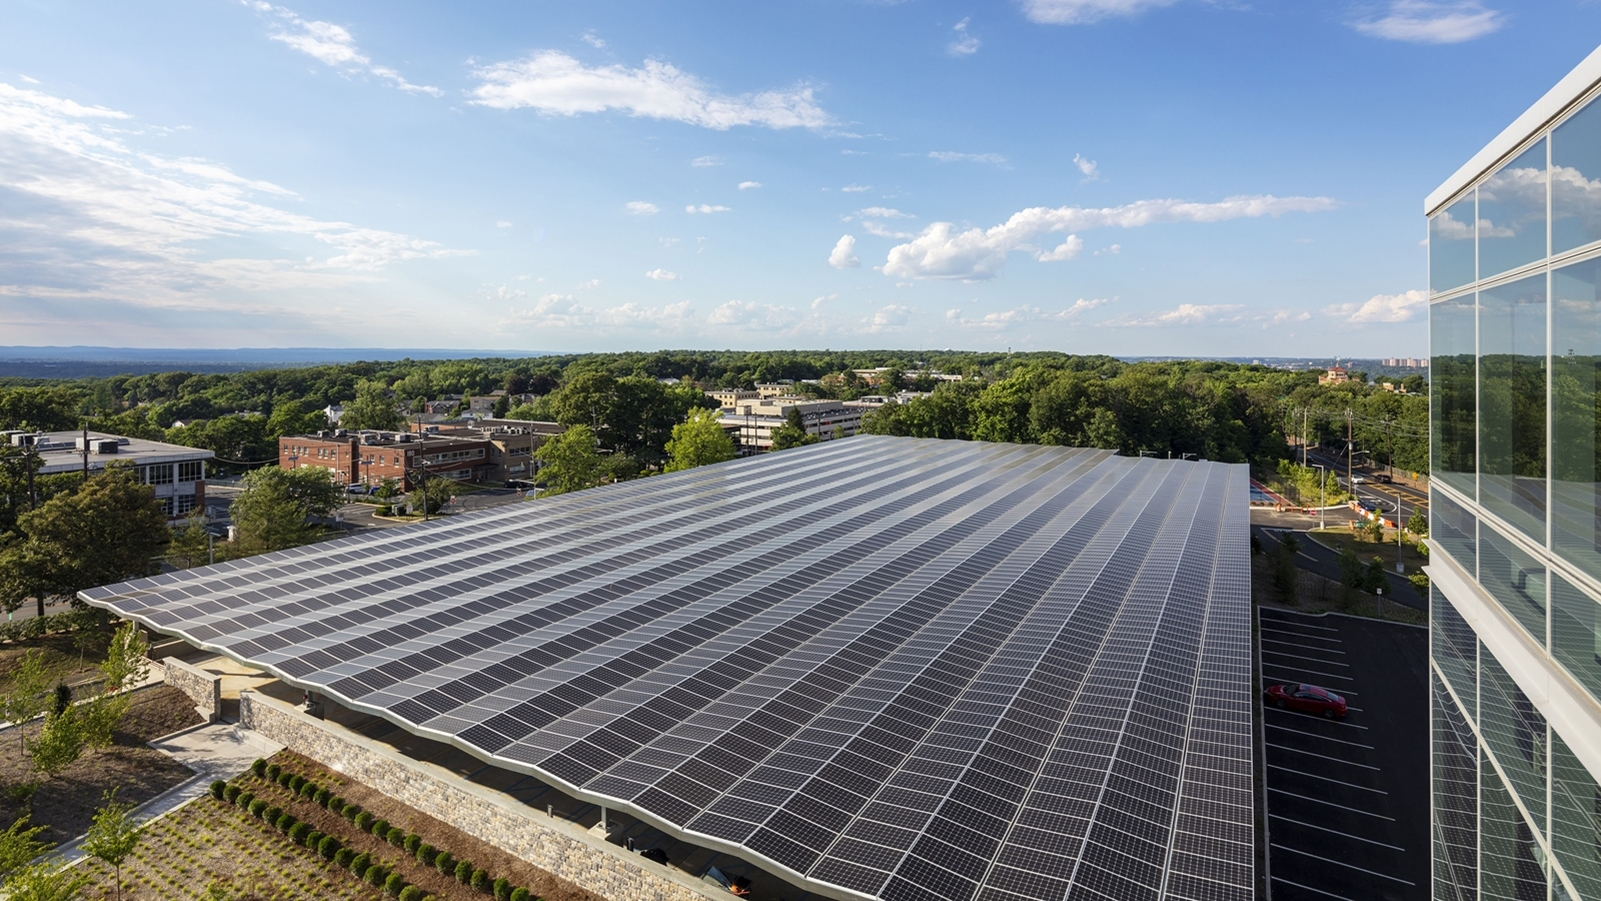 LG전자, 2030년 탄소중립 이어 2050년 재생에너지 100% 전환